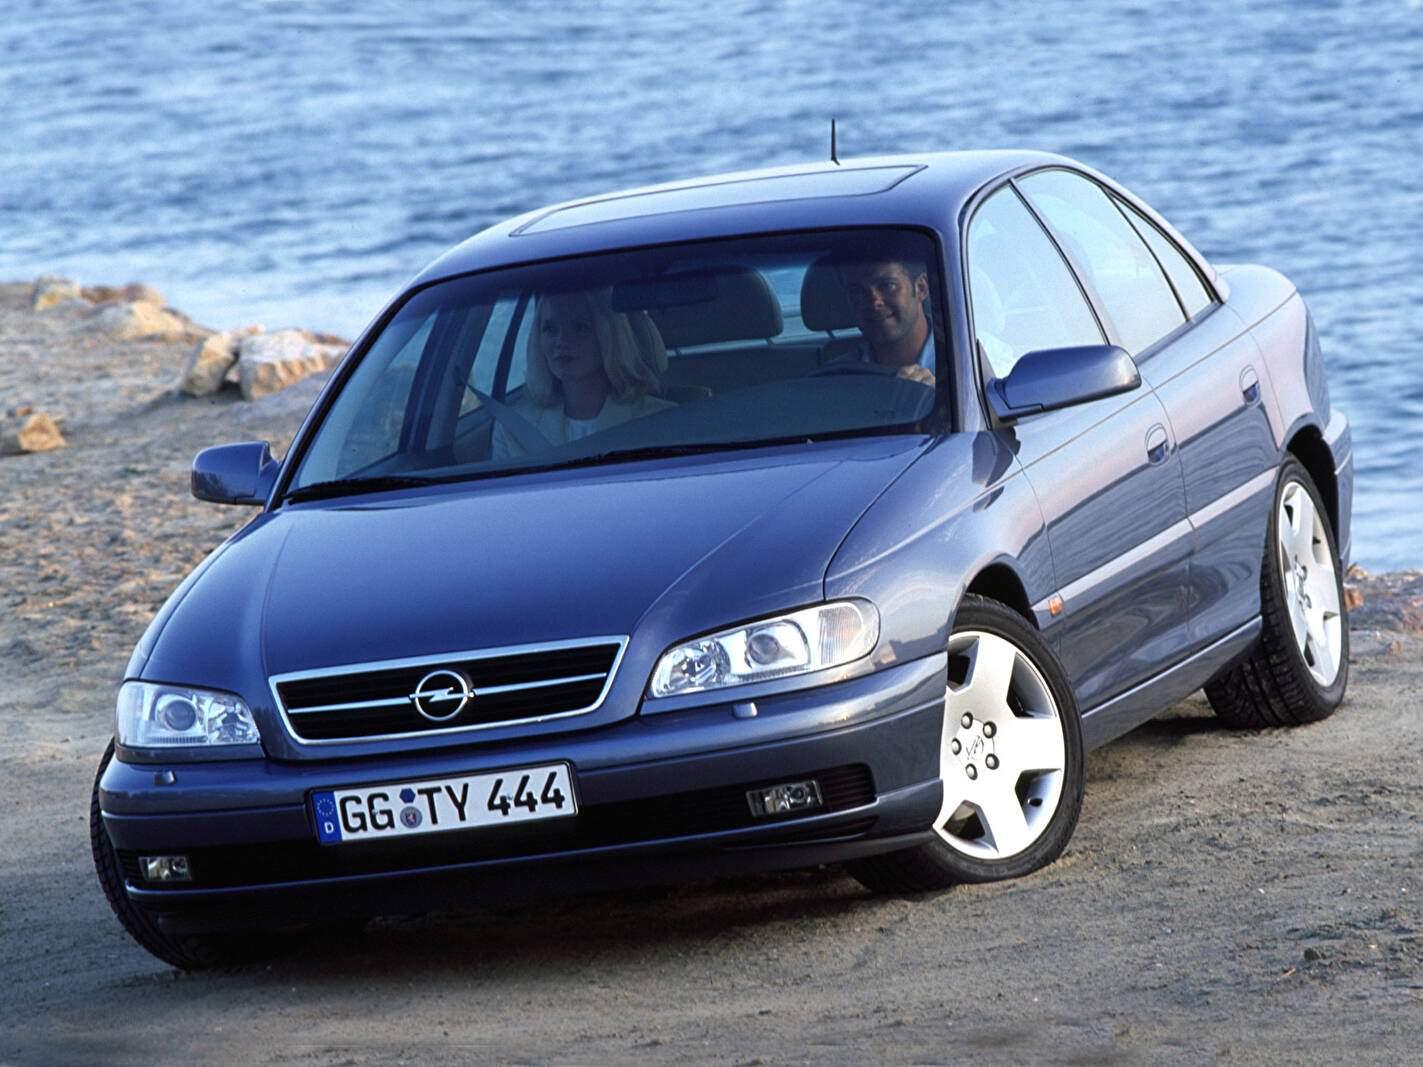 Opel Omega II 2.6 V6 (B) (1999-2003),  ajouté par fox58